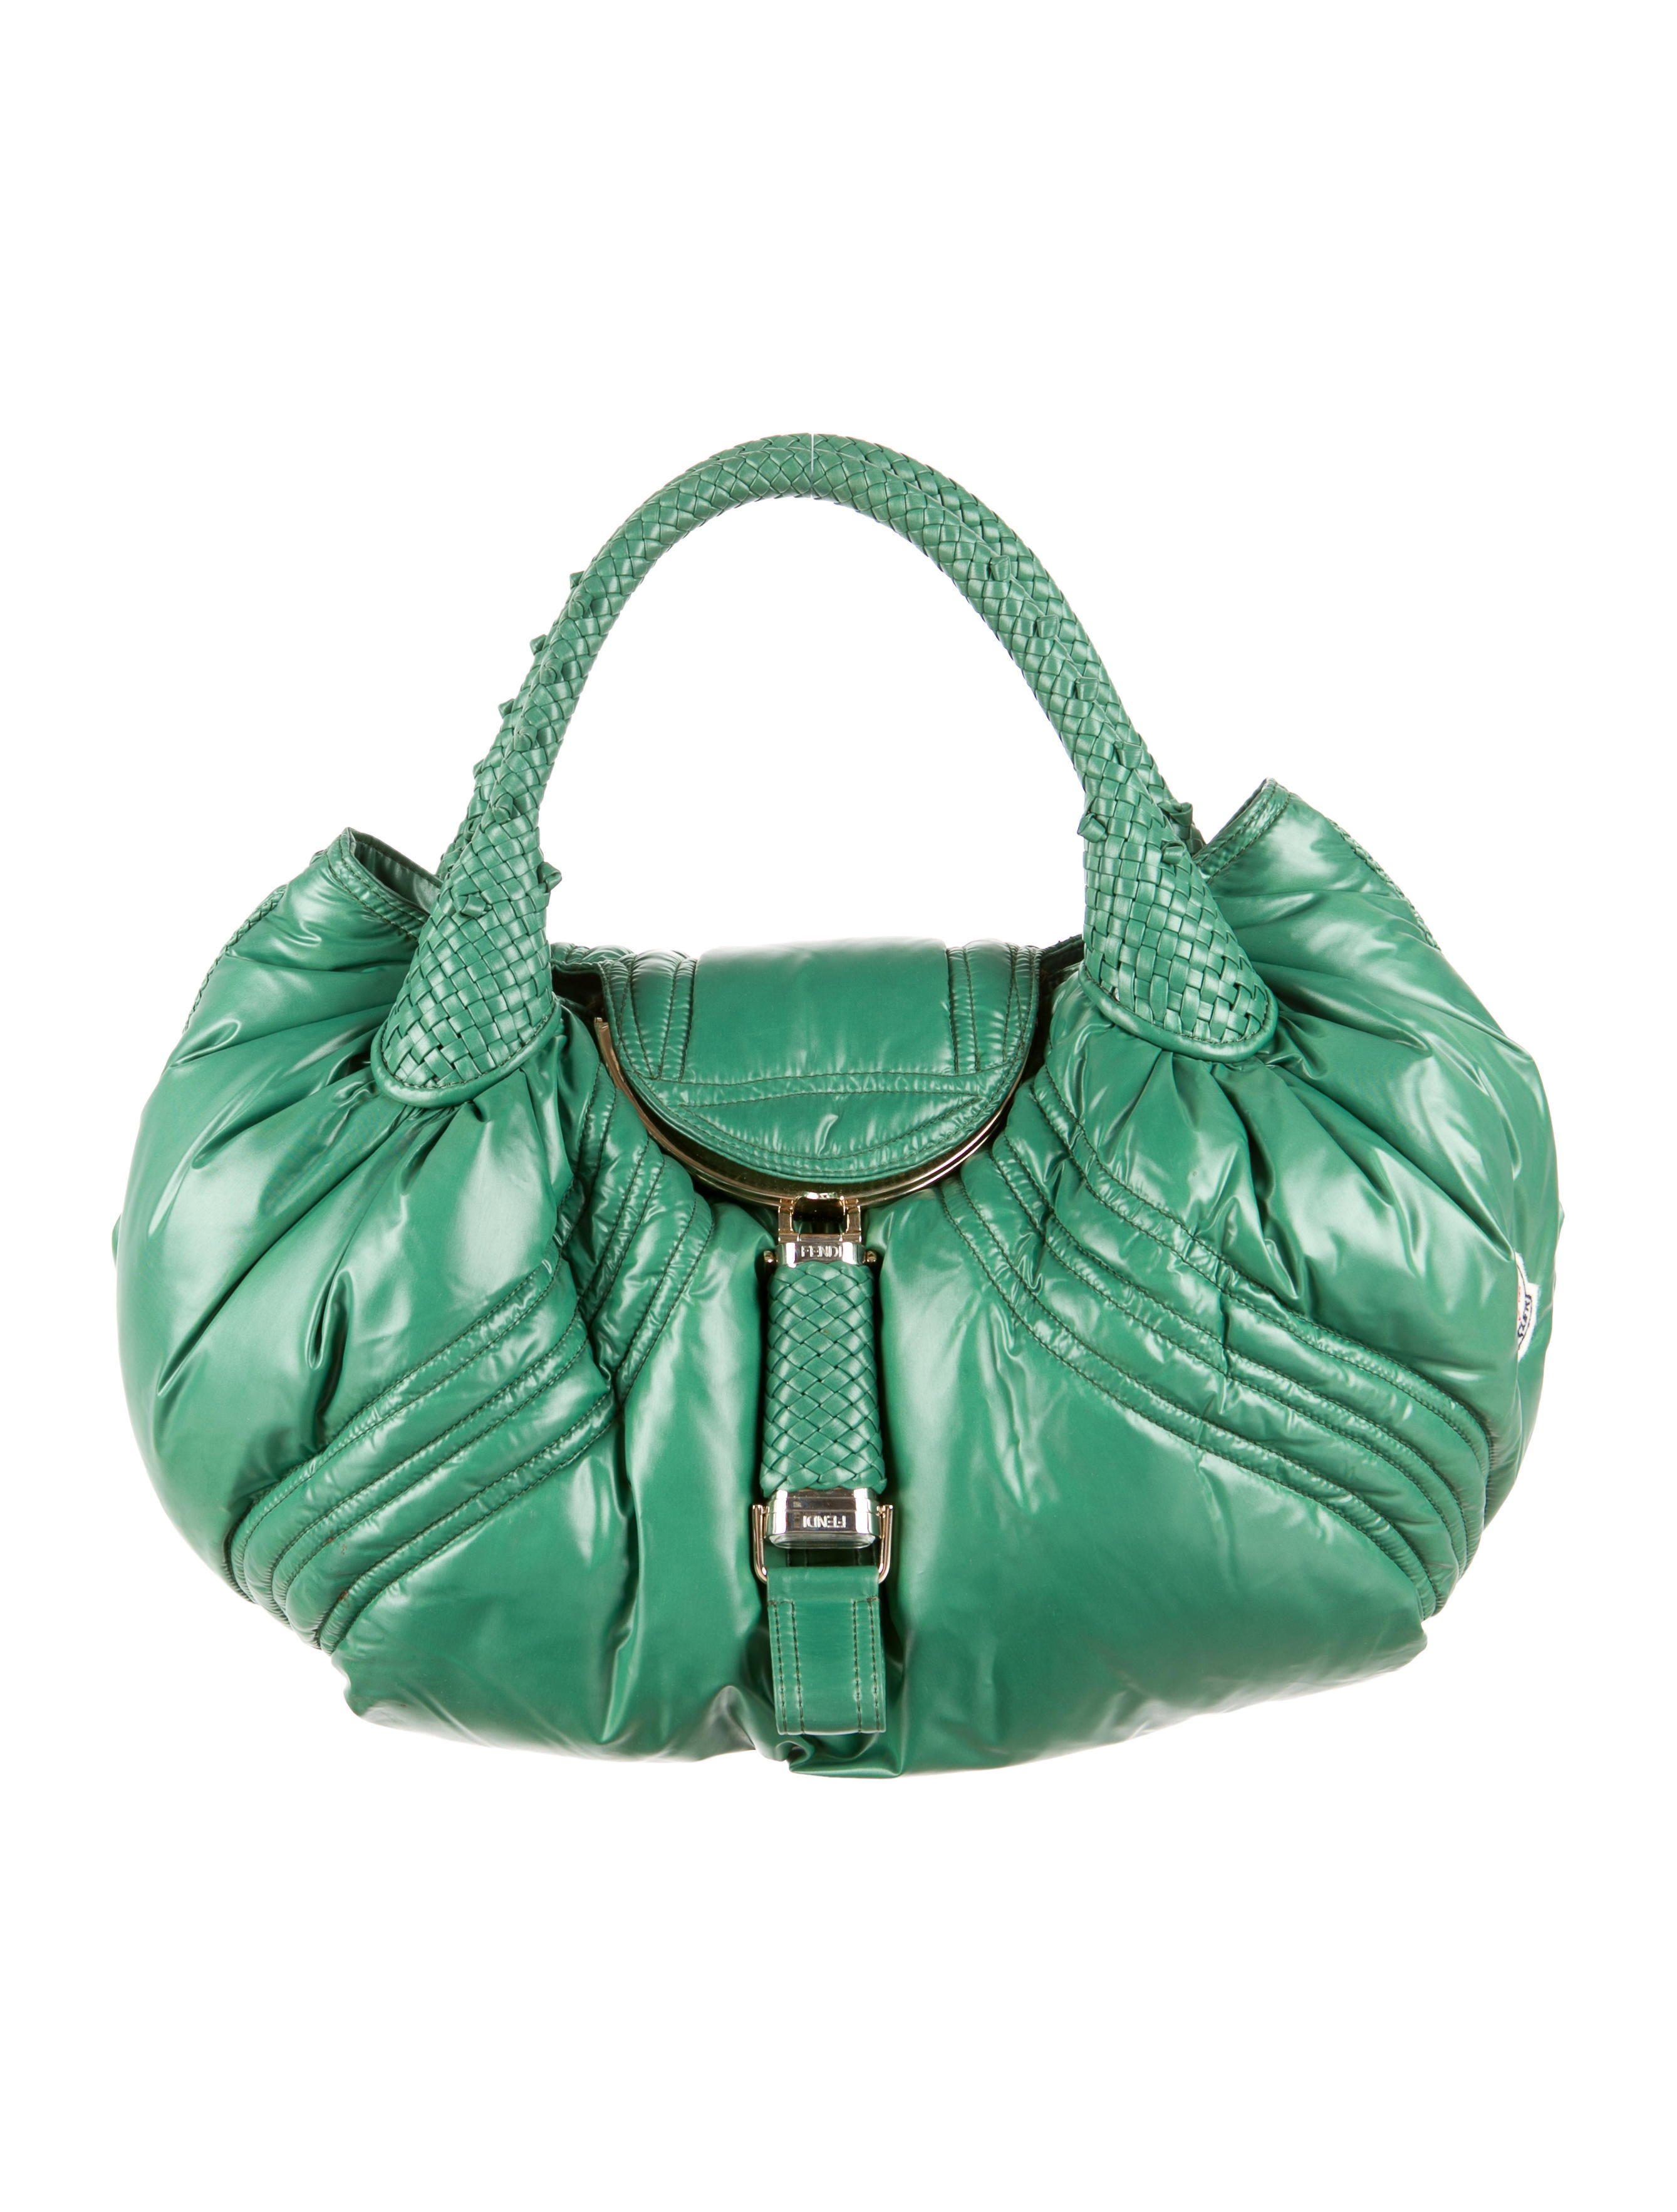 af8da3056a2a Fendi x Moncler Spy Bag - Handbags - FEN30892